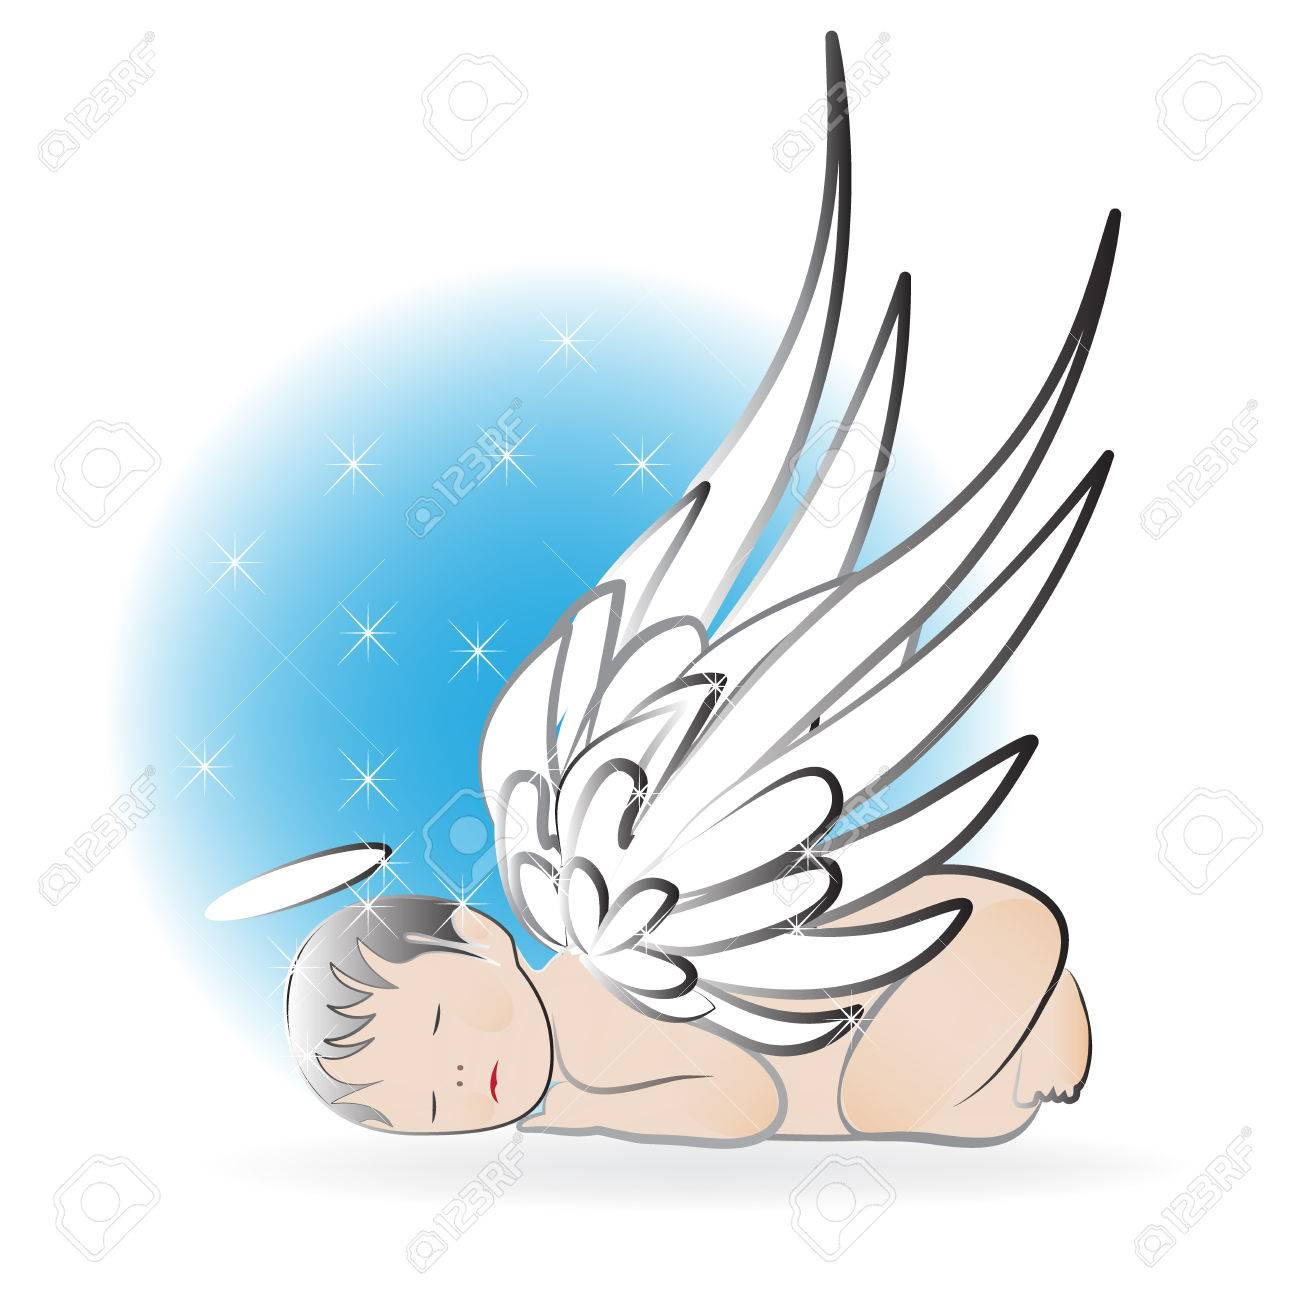 Sleeping baby angel clipart jpg download Sleeping baby angel clipart 5 » Clipart Station jpg download